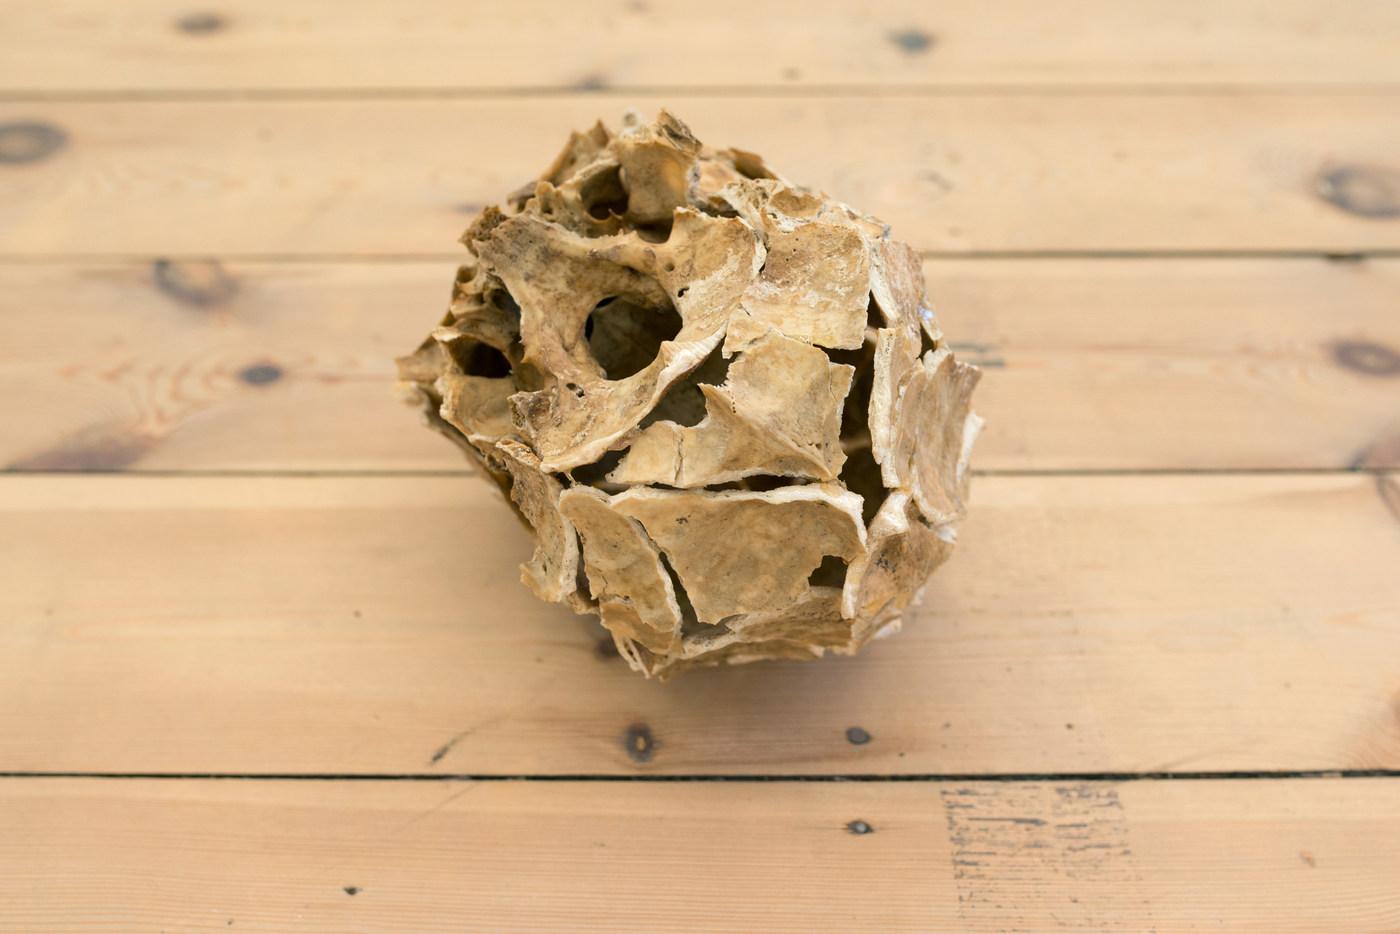 Ariel Schlesinger, Untitled (Inside Out Skull), 2014 (4)